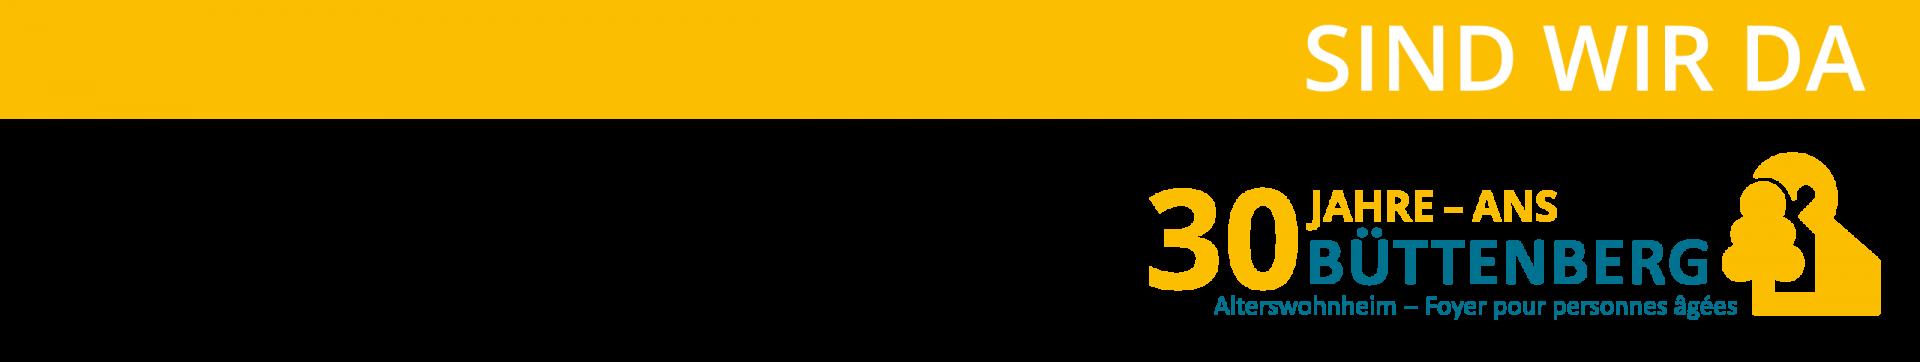 Buettenberg_Visual_1_bottom